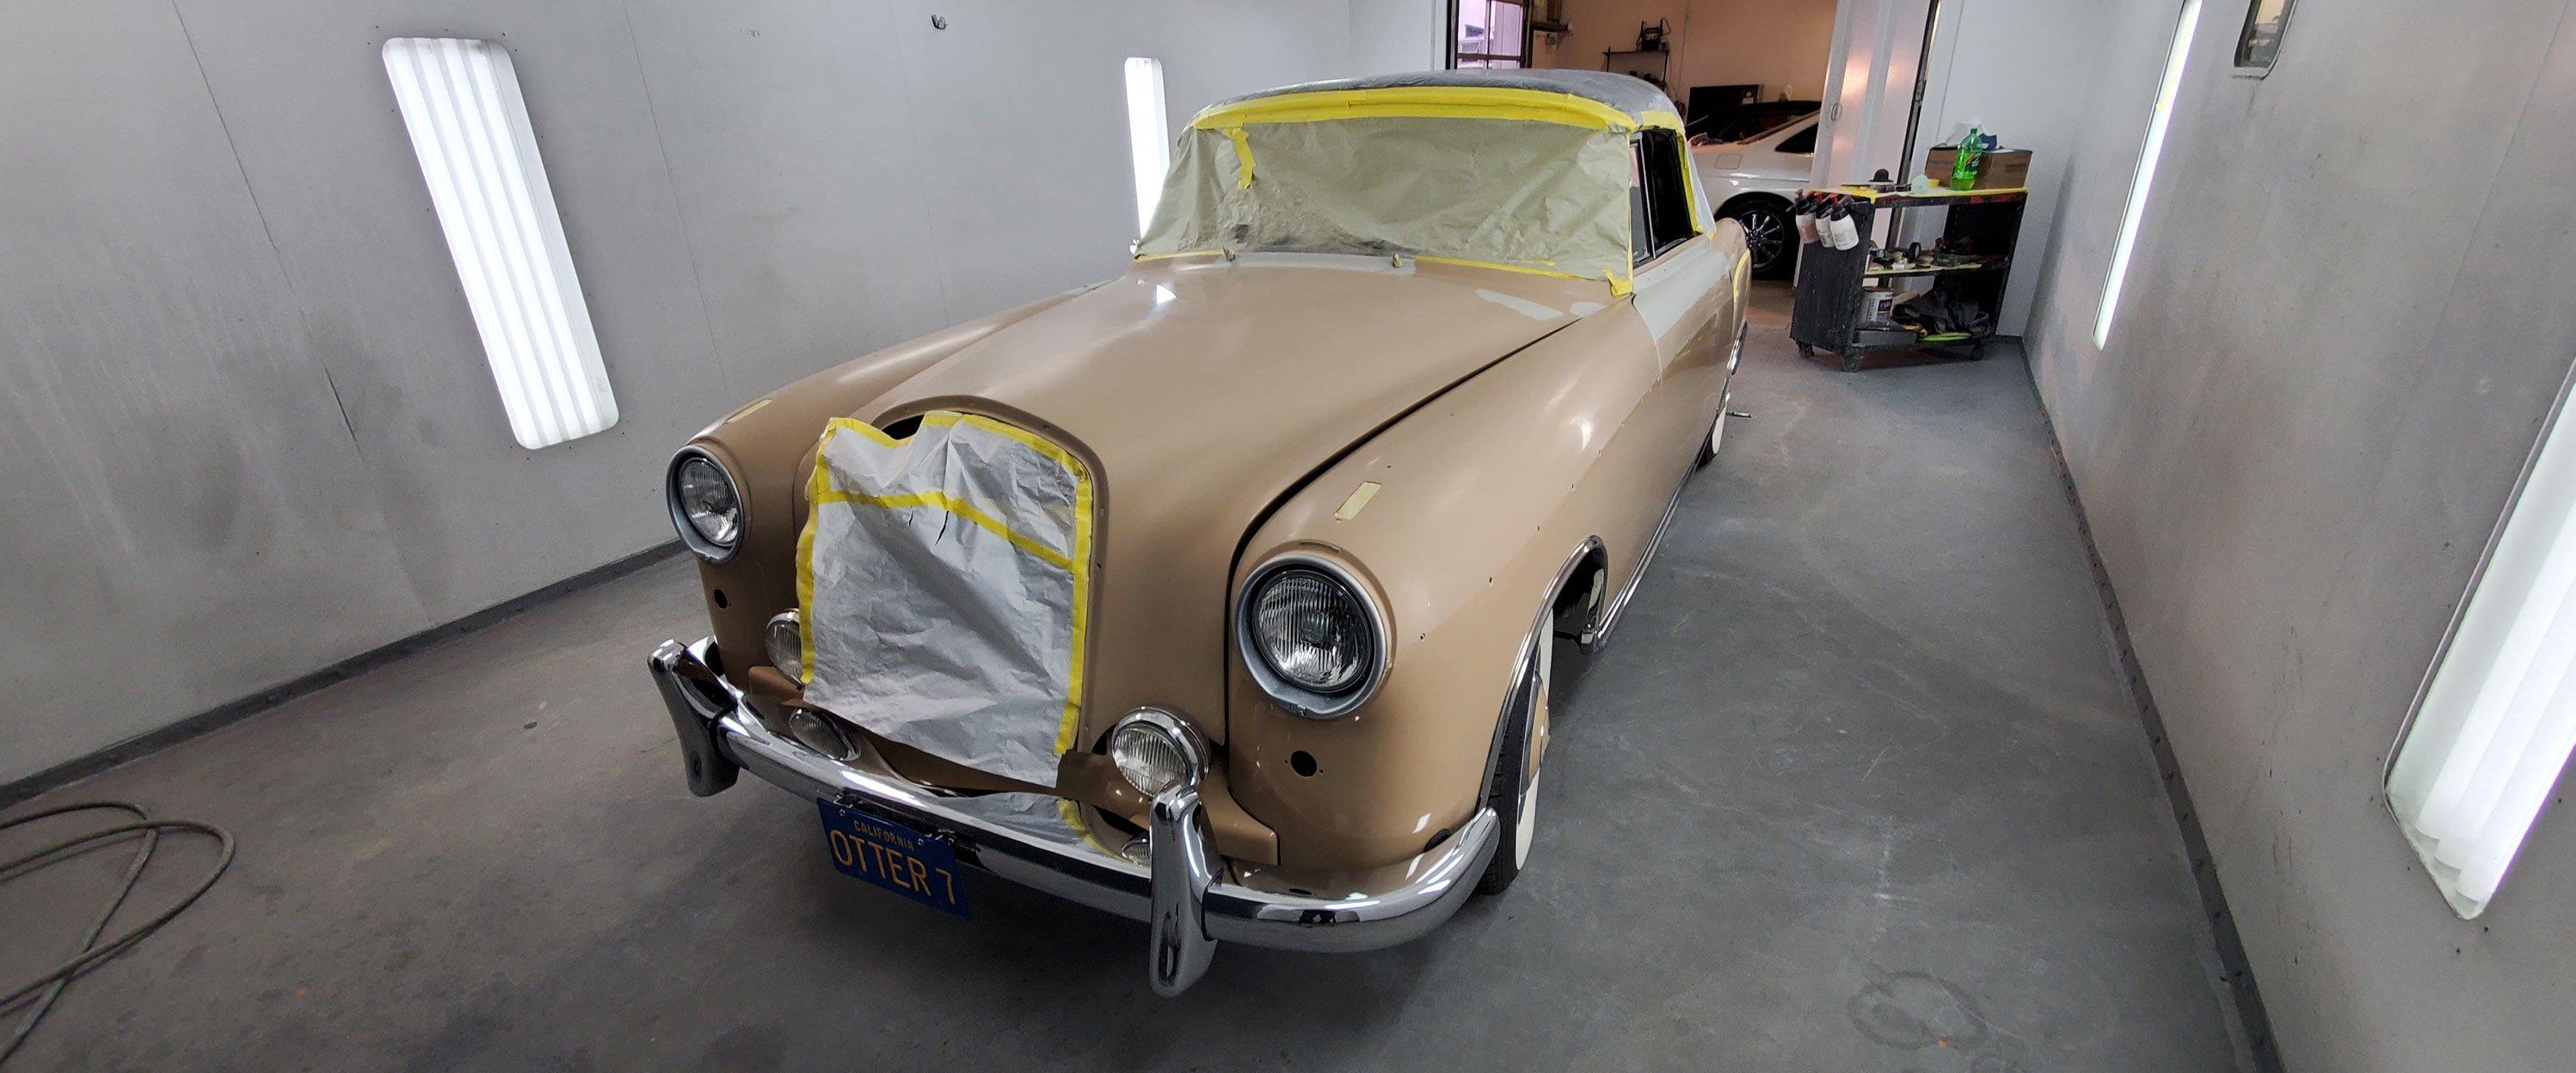 1959-Mercedes-Benz-220S-Tan-R2-slideshow-002@2x